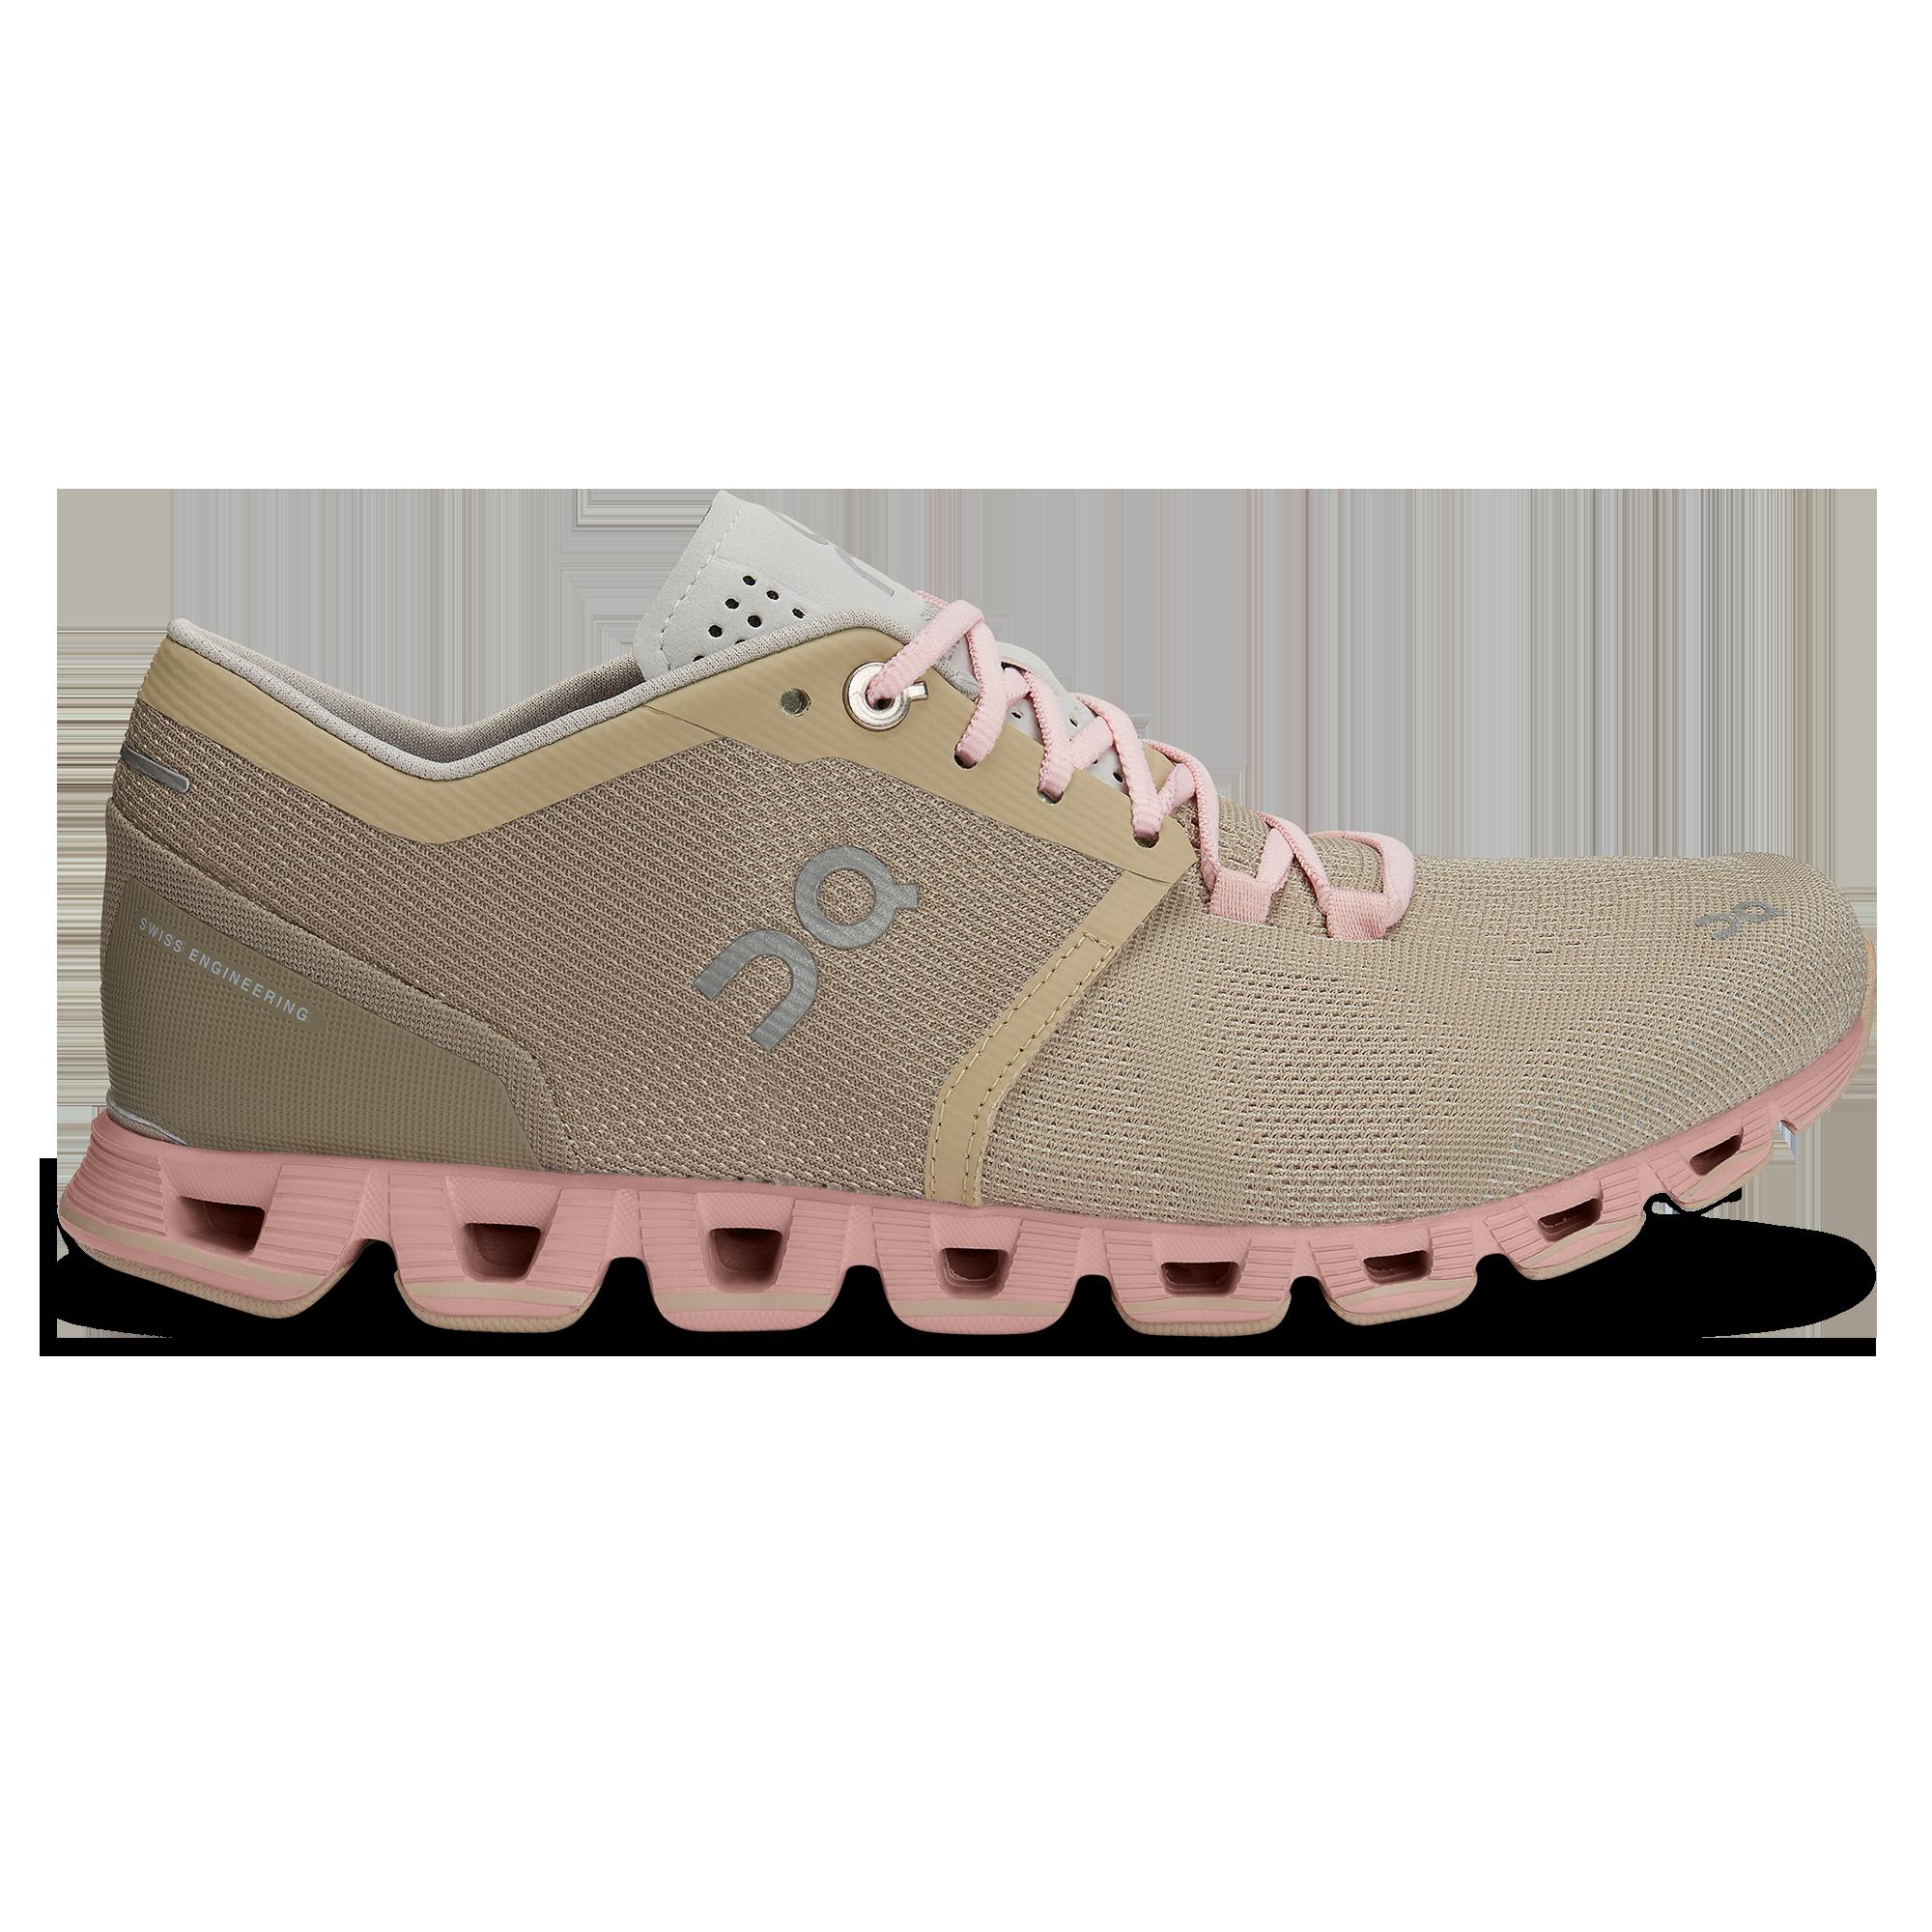 Cloud X - Workout \u0026 Training Shoe | On